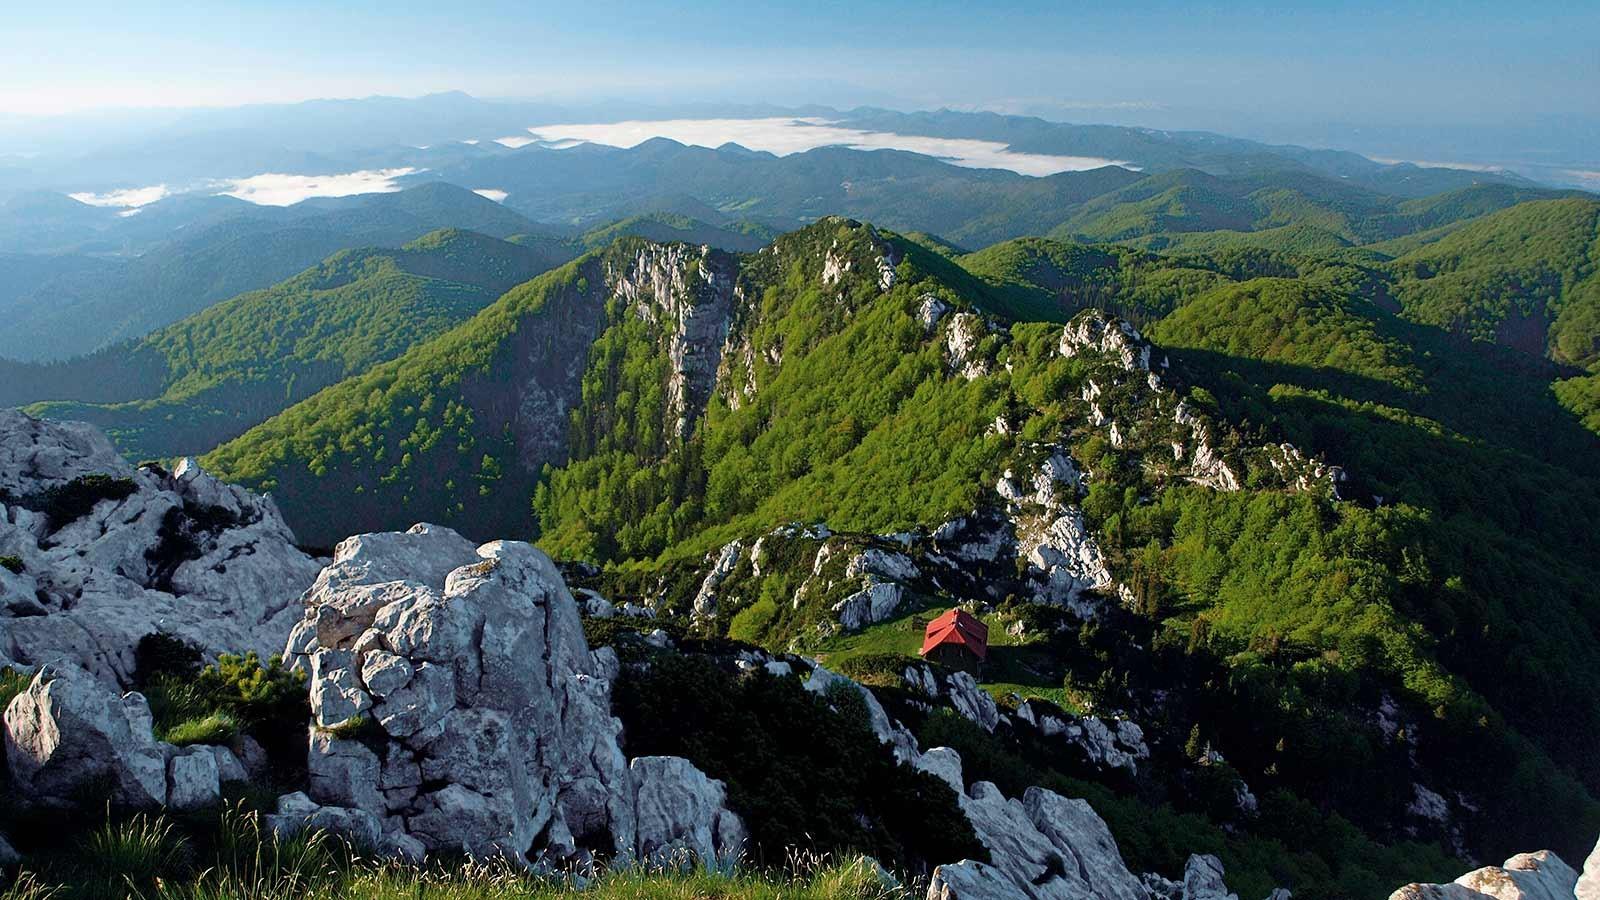 Les montagnes Gorski Kotar